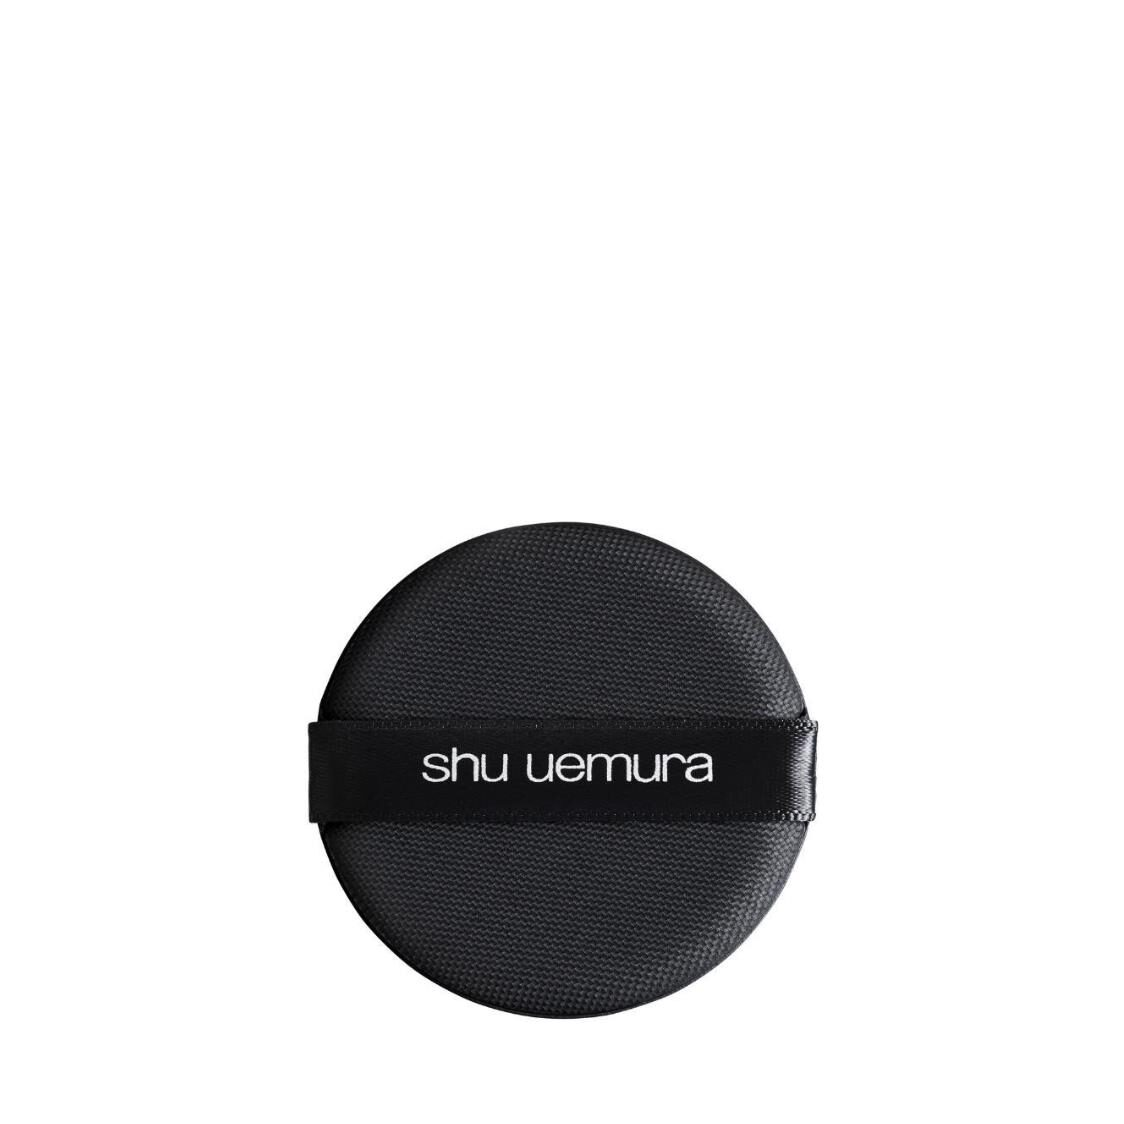 Shu Uemura Unlimited Cushion Puff